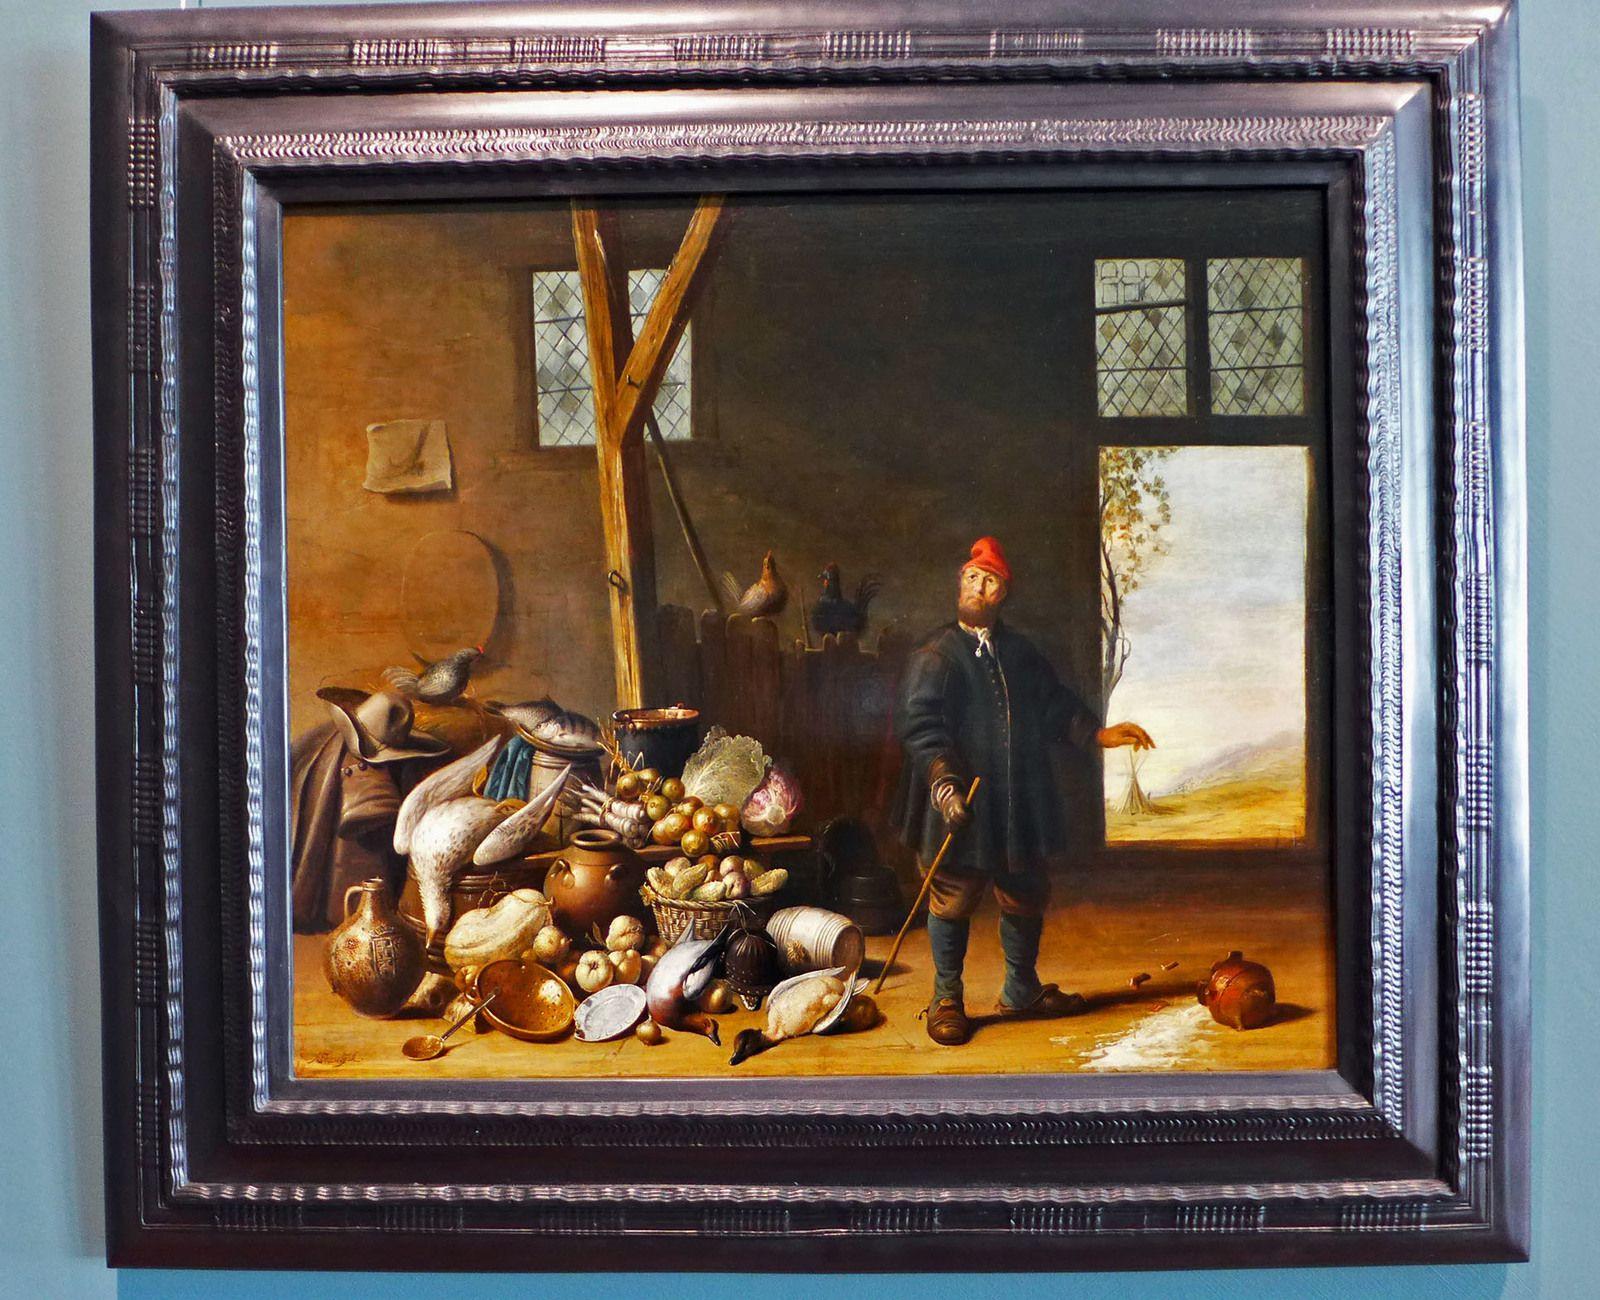 Harmen van STEENWYCK (1612-1656), La Cruche cassée